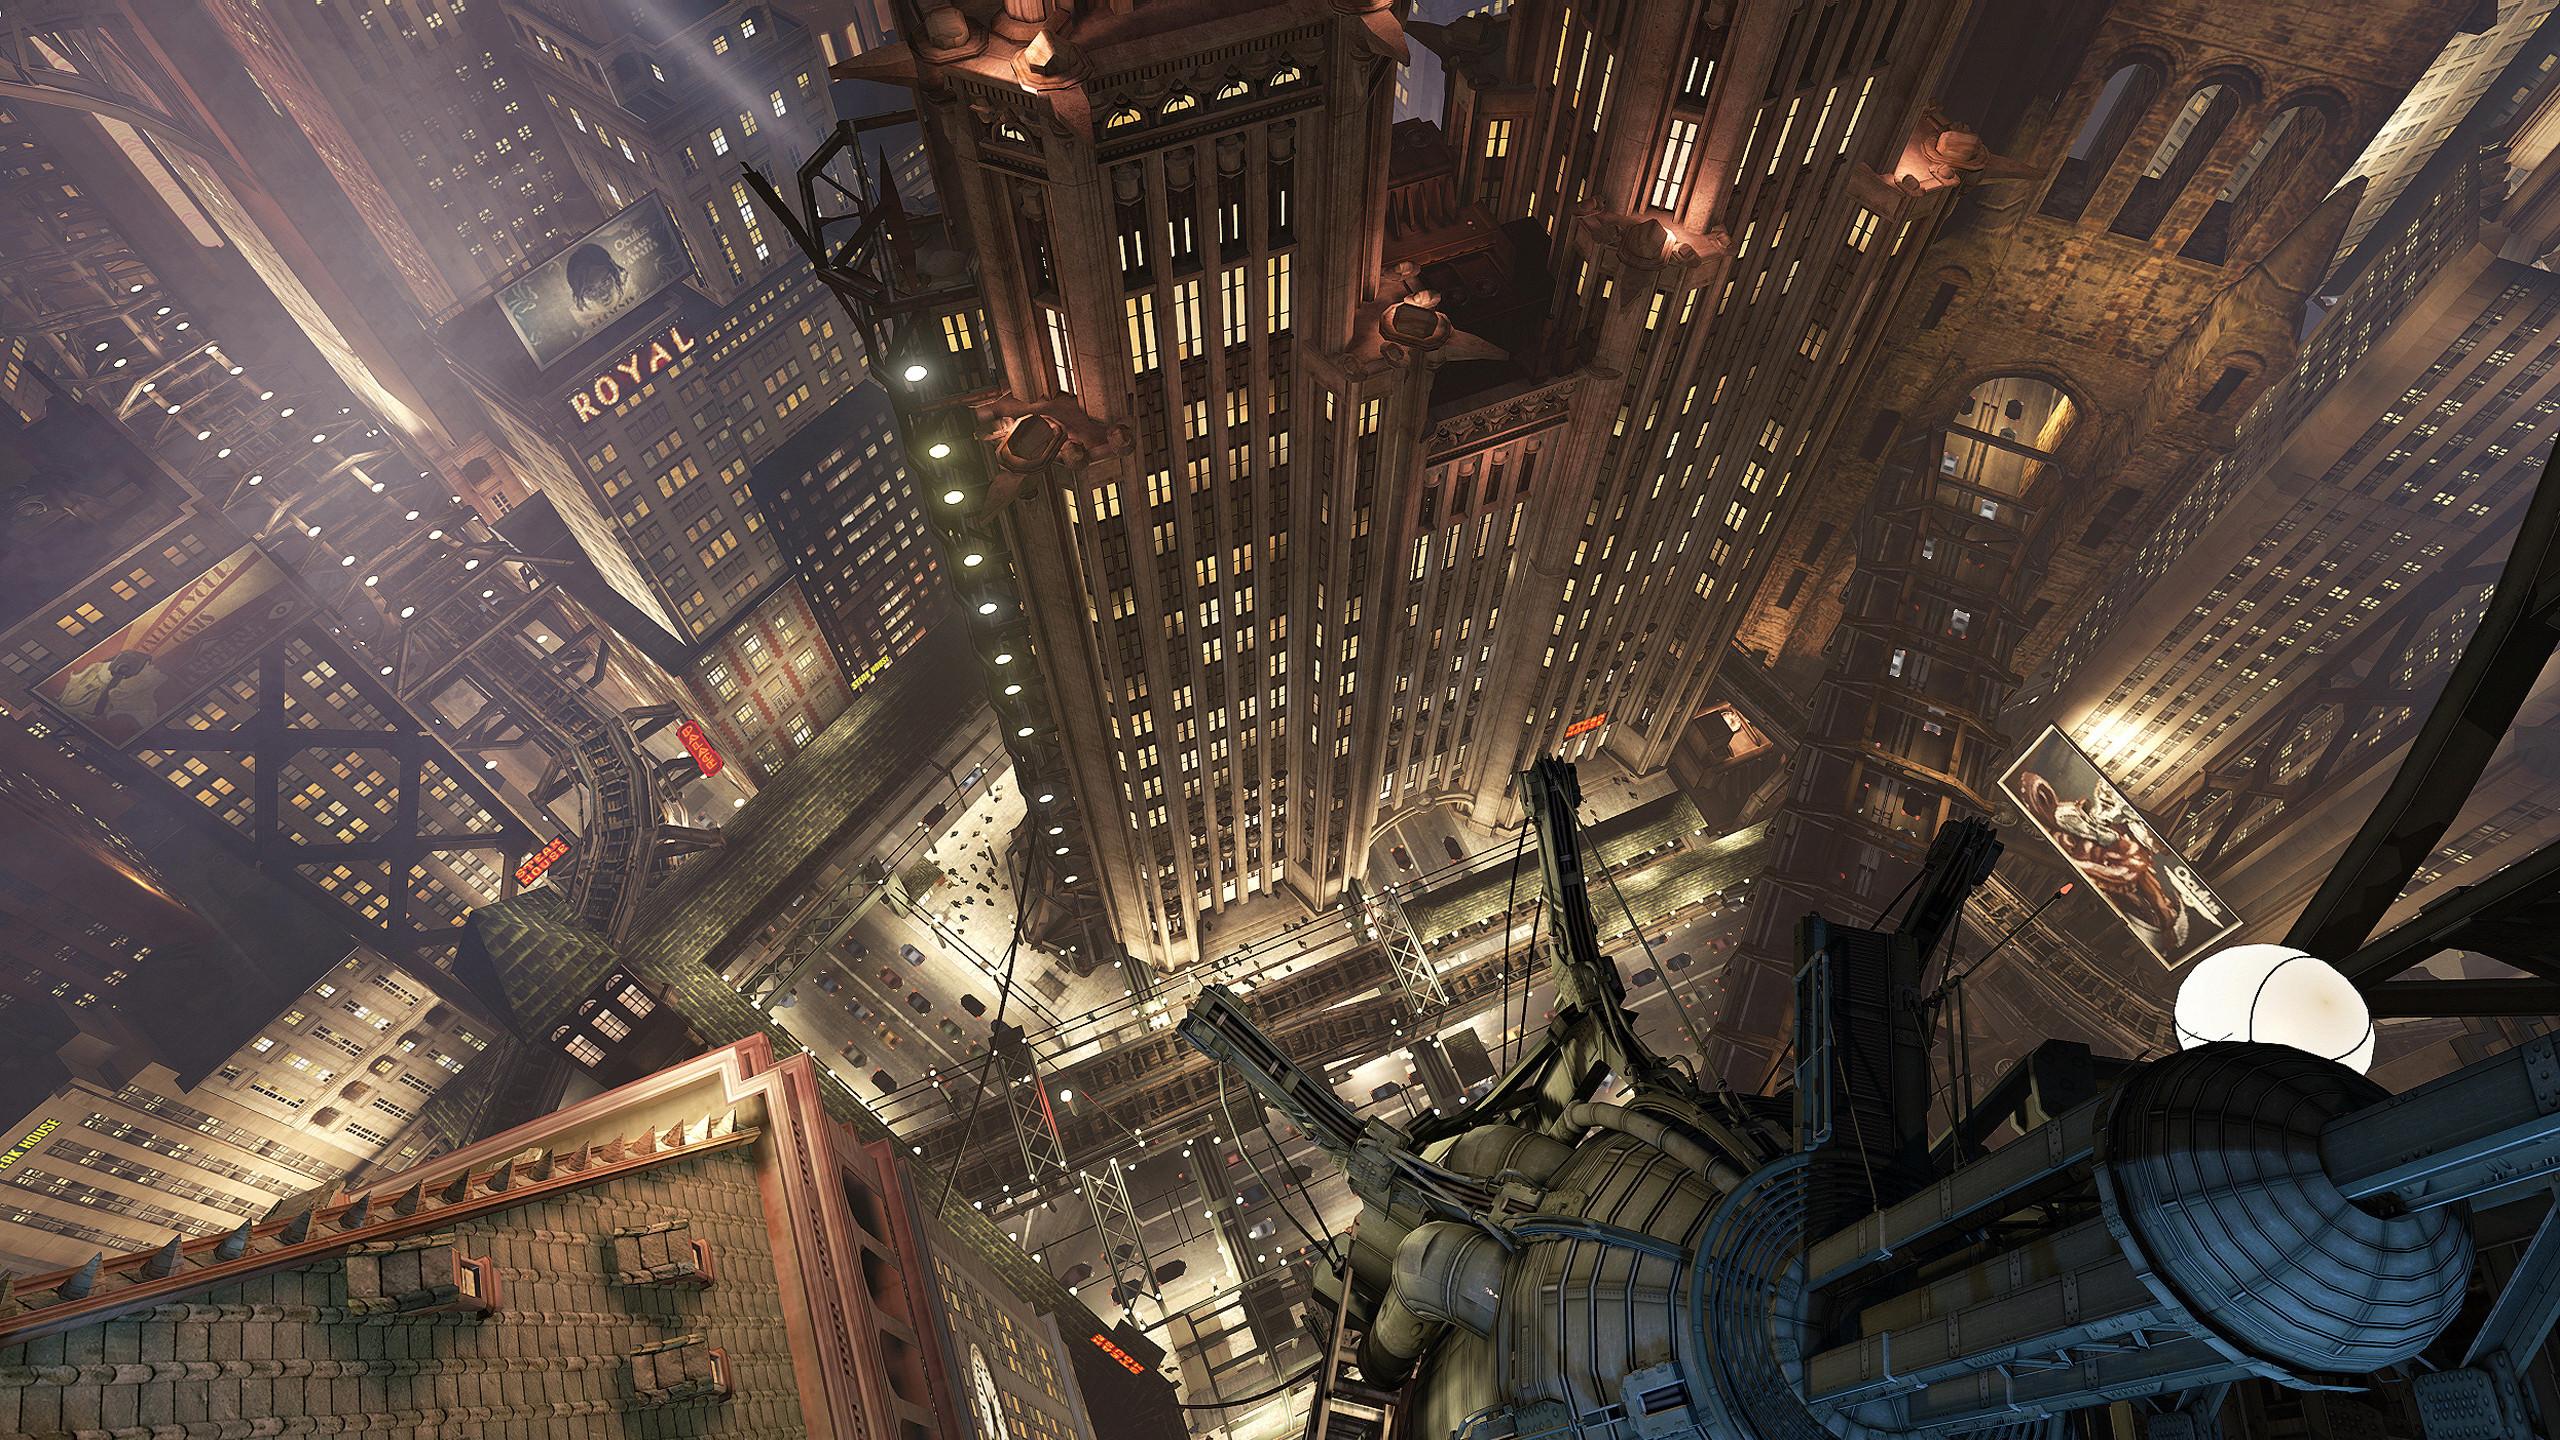 Oculus Dreamdeck Skyscraper: 2014 by RJ Ranola